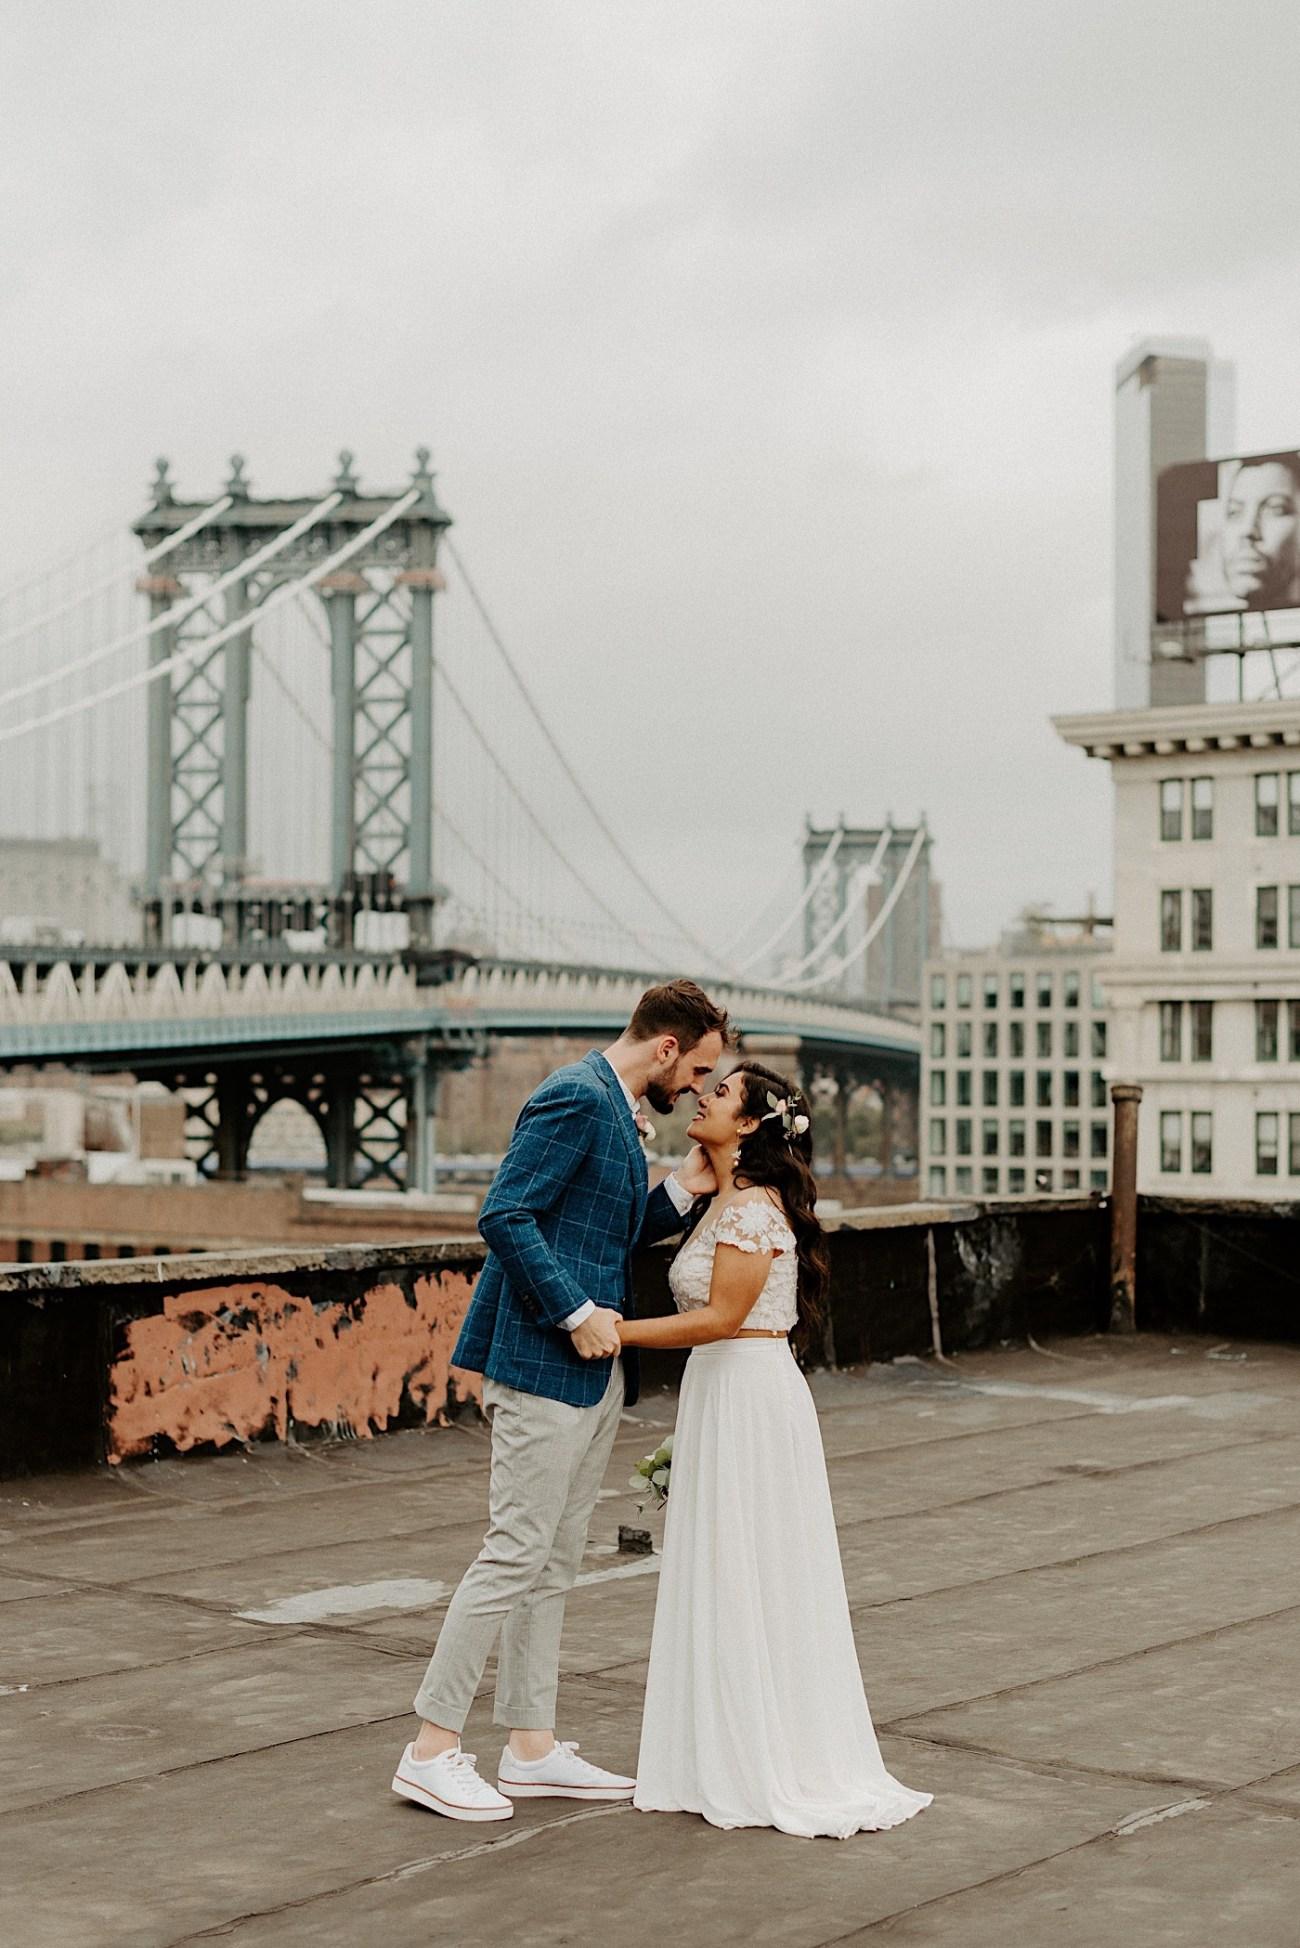 LIC Wedding Greenpoint Wedding LIC Elopement New York Wedding Photographer 076